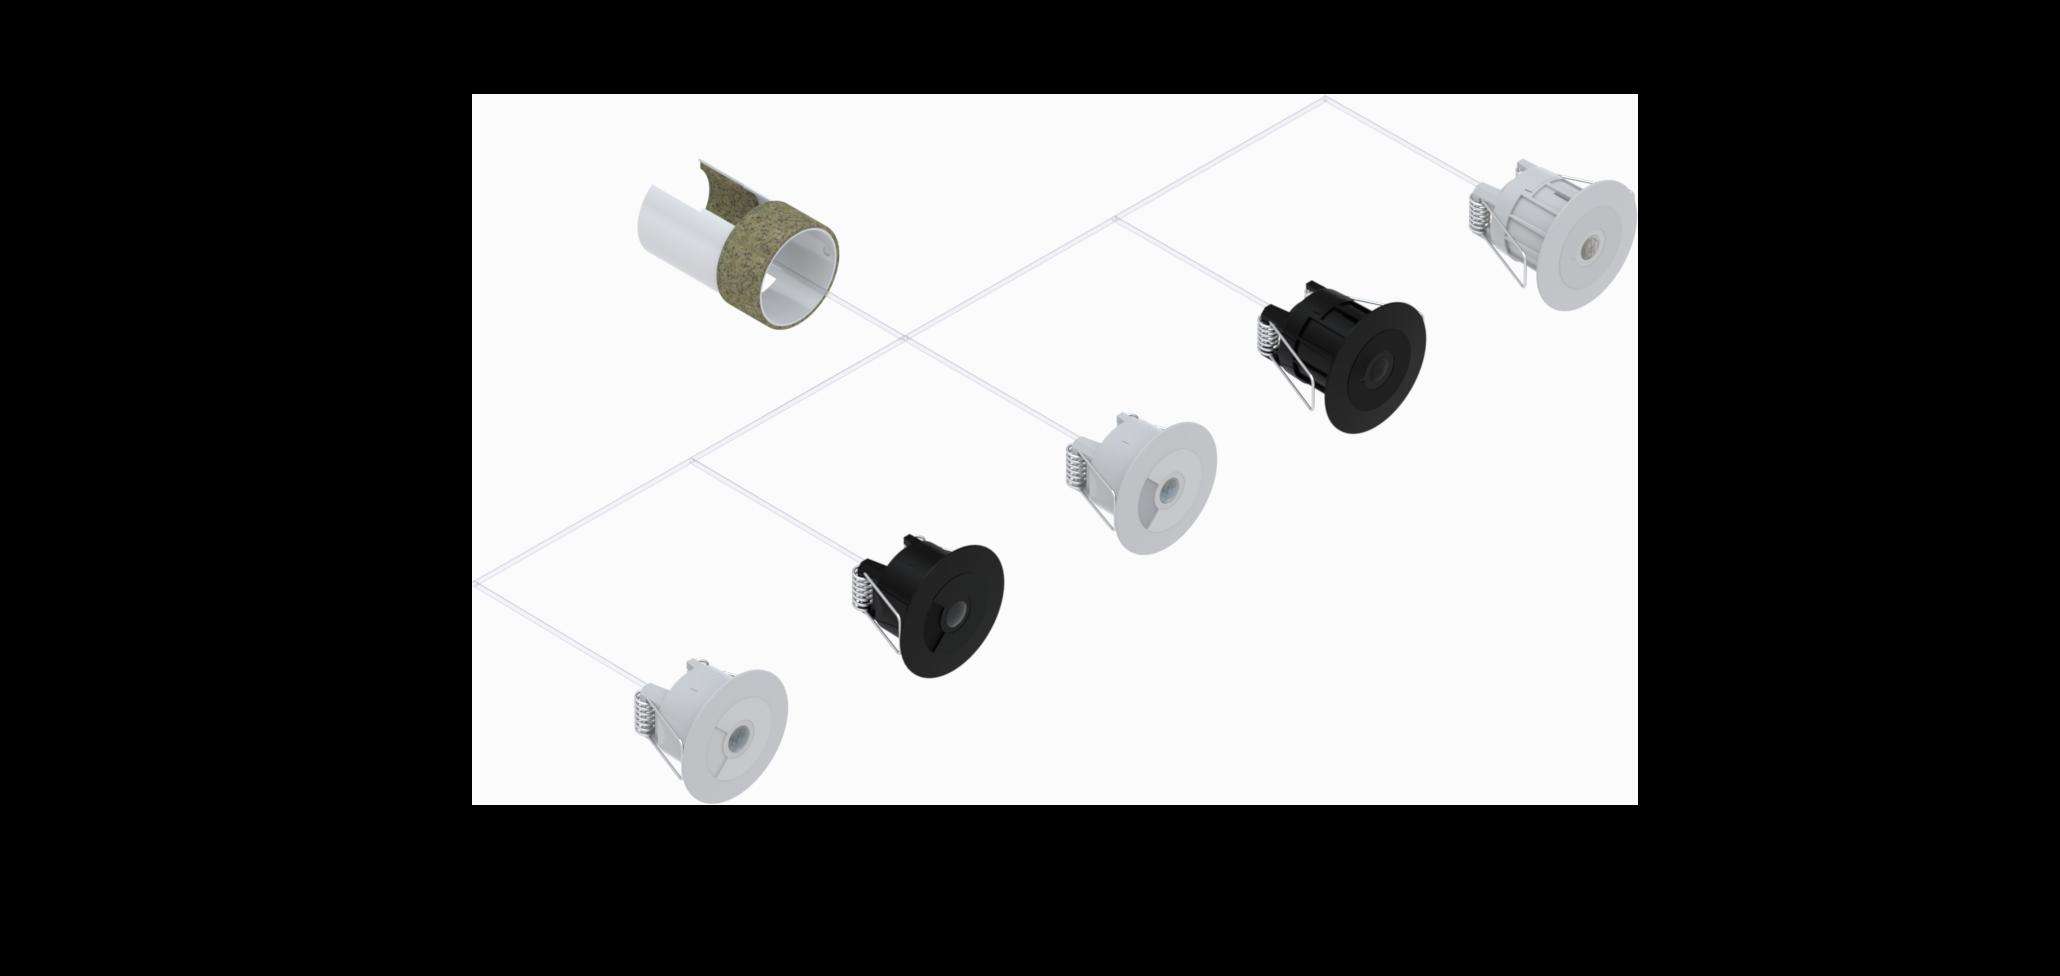 Faradite motion sensor range lutron crestron loxone control4 rako Volt Free potential free dry contact